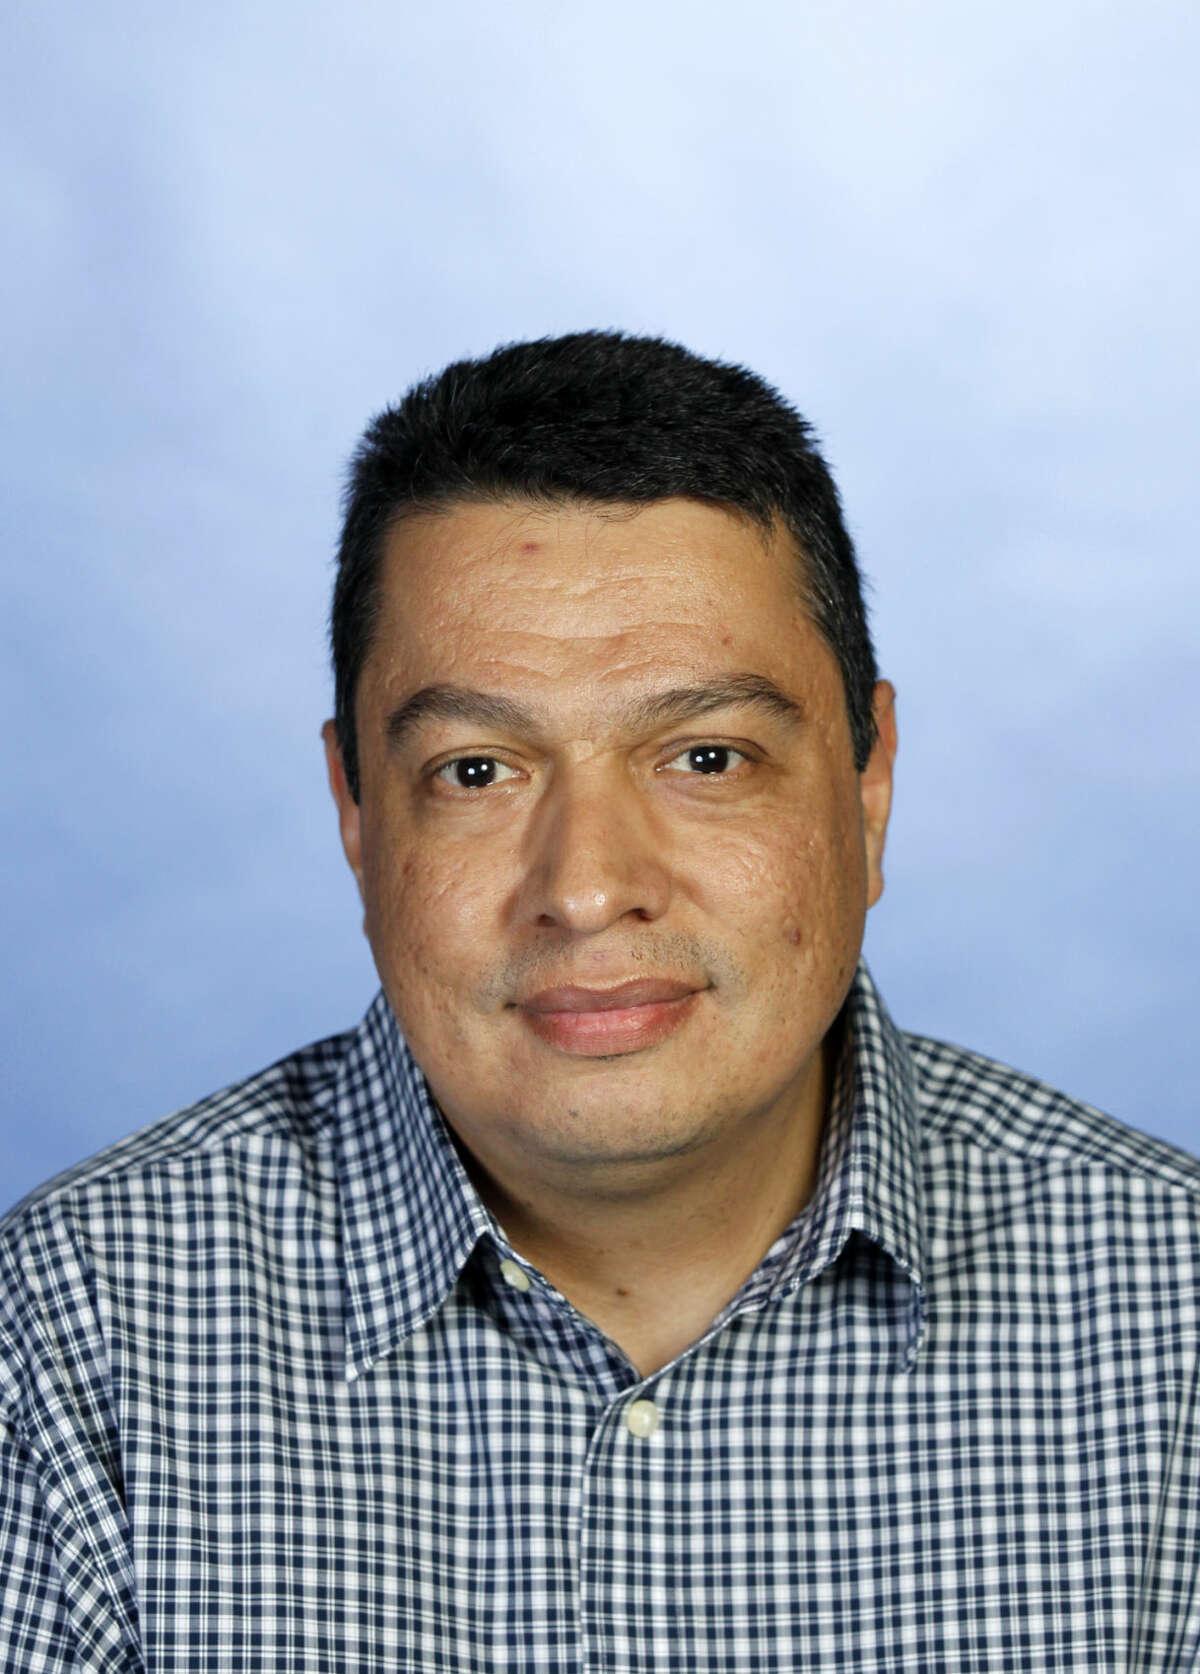 Staff mug shot of Oscar LeRoy photographed Wednesday, April 1, 2015. James Durbin/Reporter-Telegram